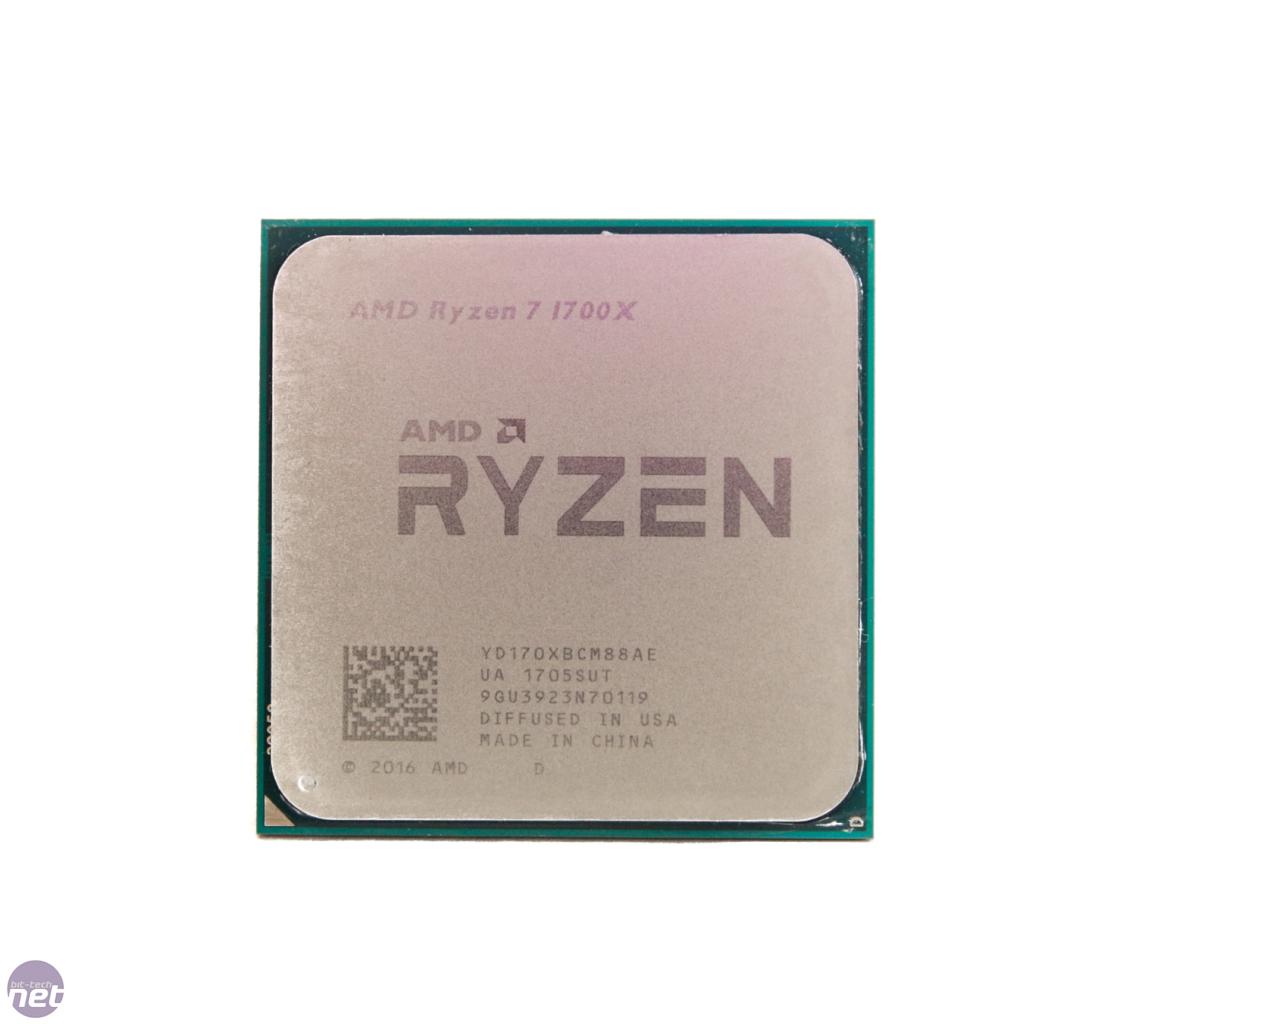 Amd Ryzen 7 1700x Review Bit Tech Net